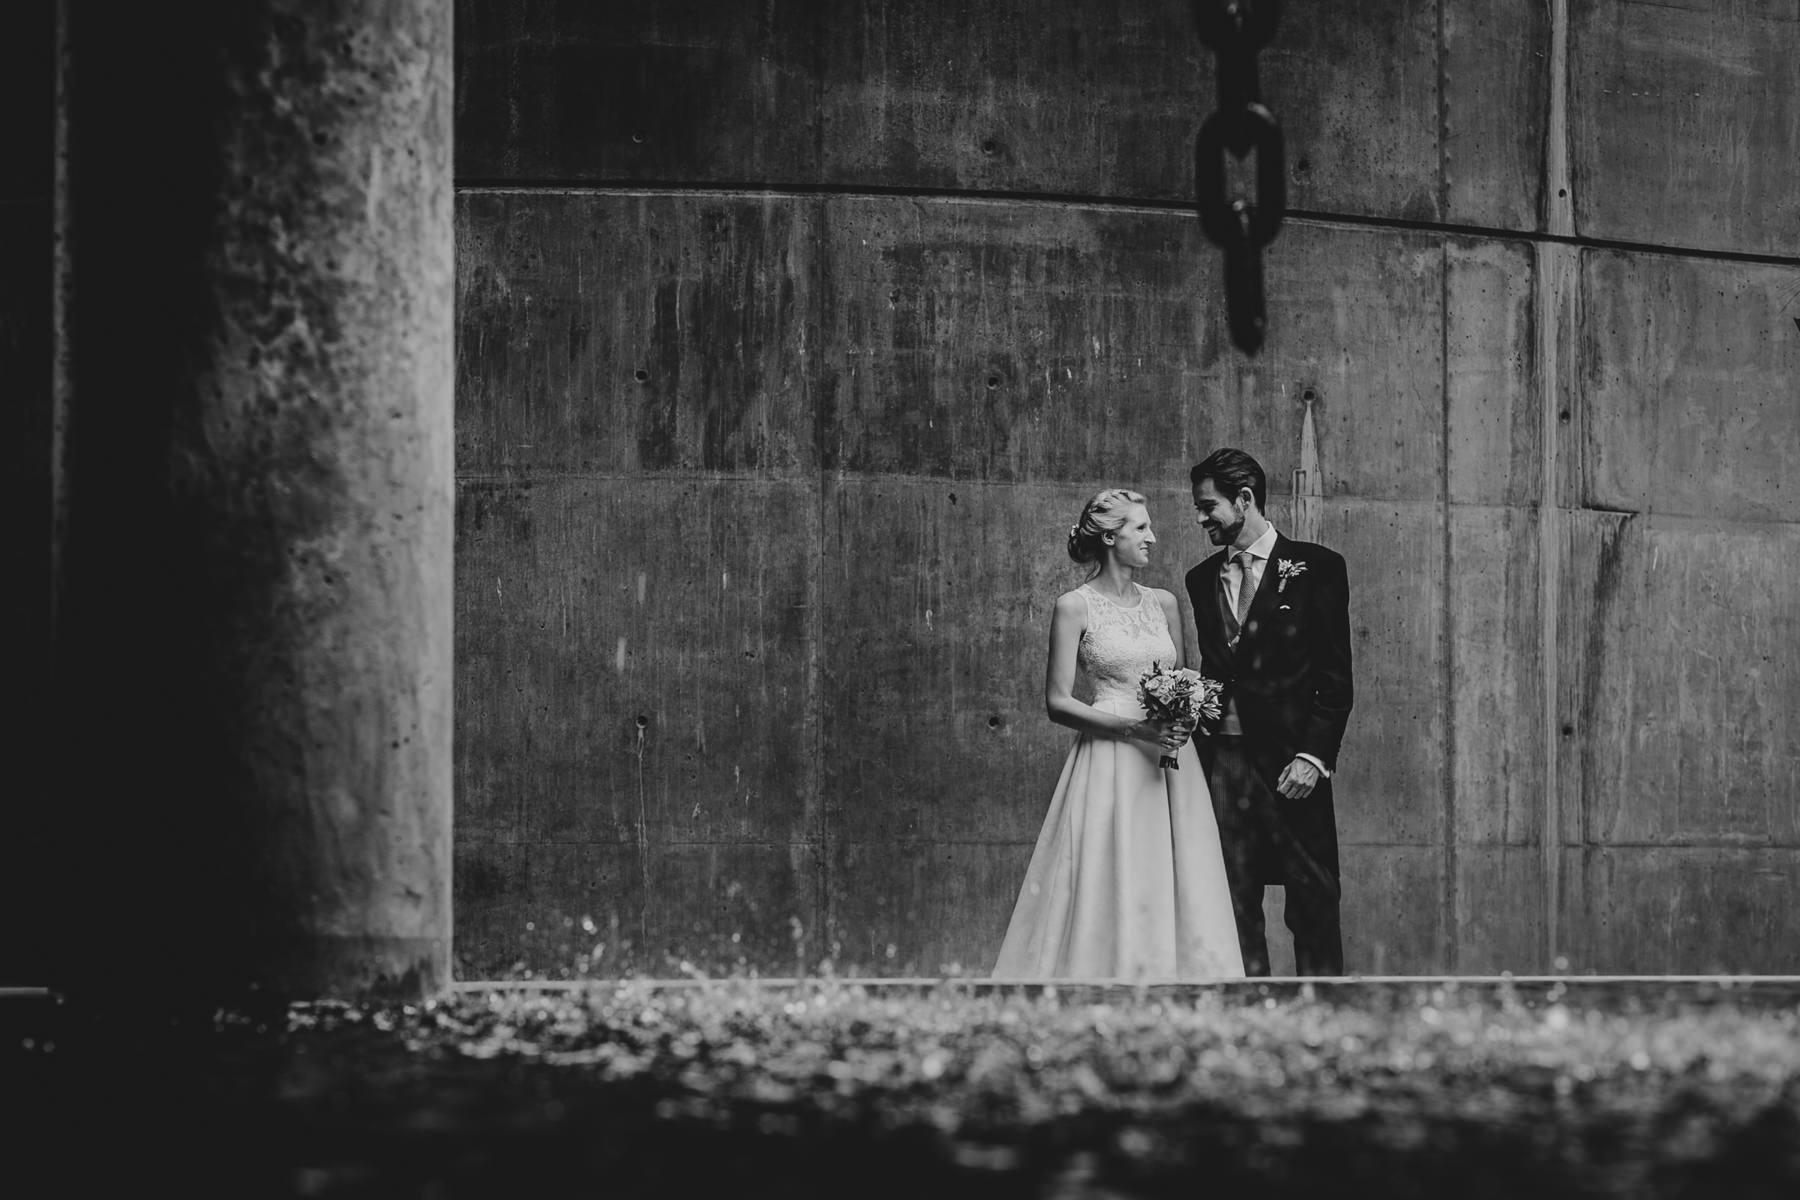 Wedding_Photography_Carlos_Hevia_Barcelona_Berlin_38.jpg